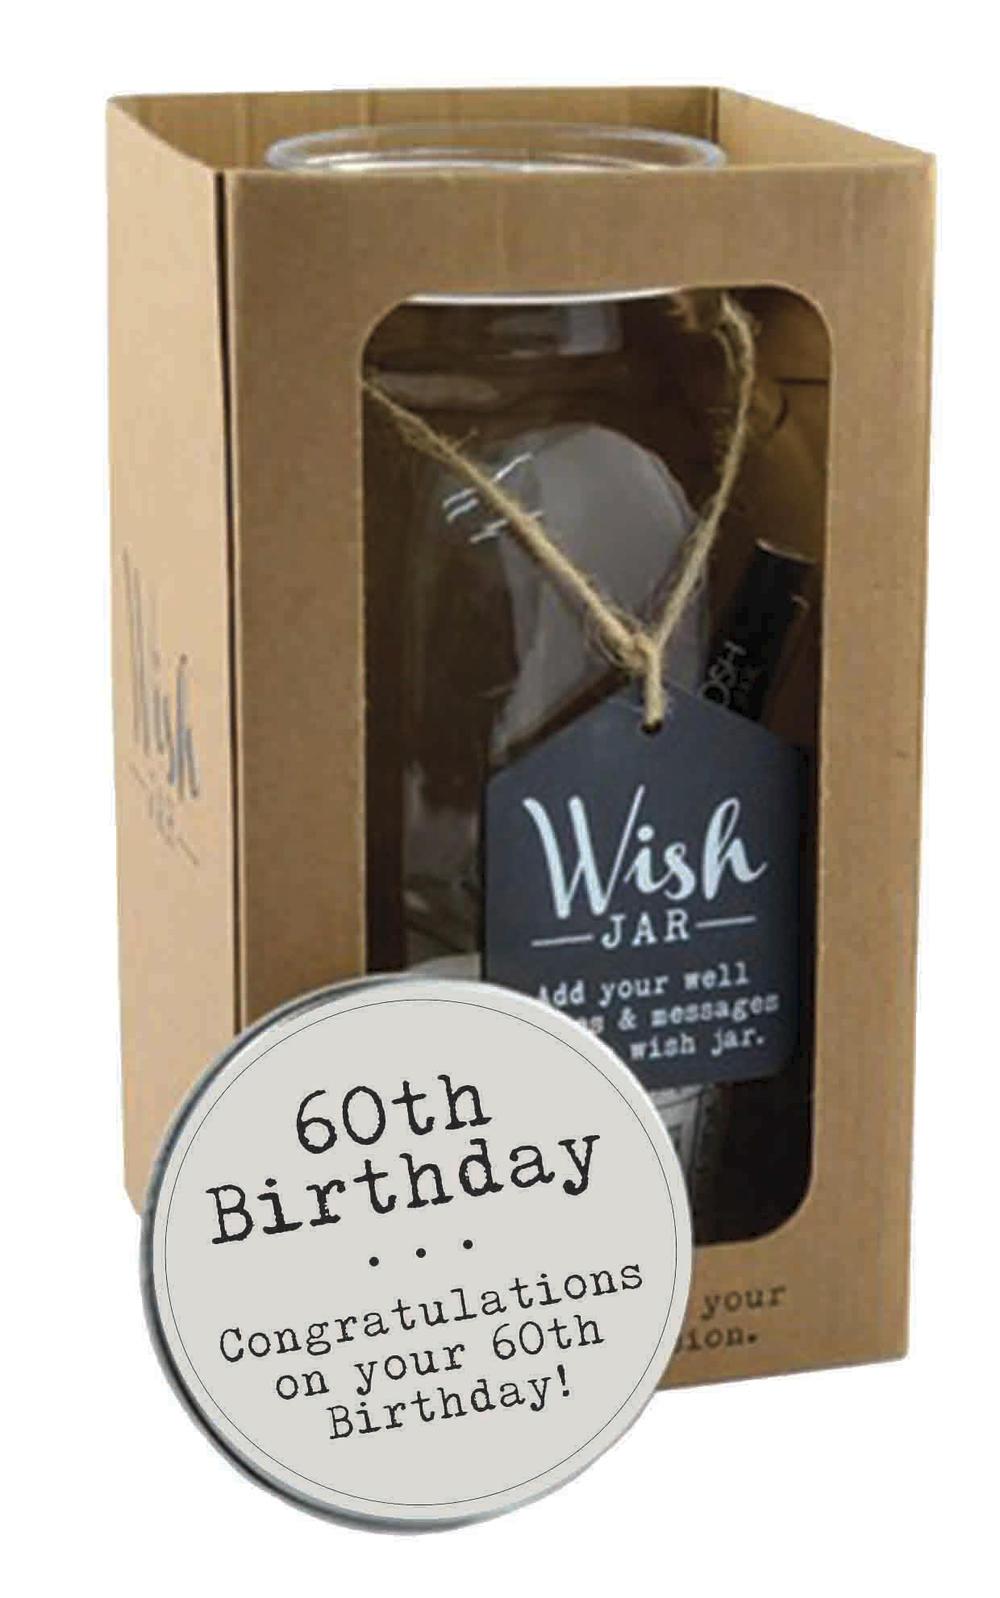 Splosh 60th Birthday Wish Jar Gift Idea